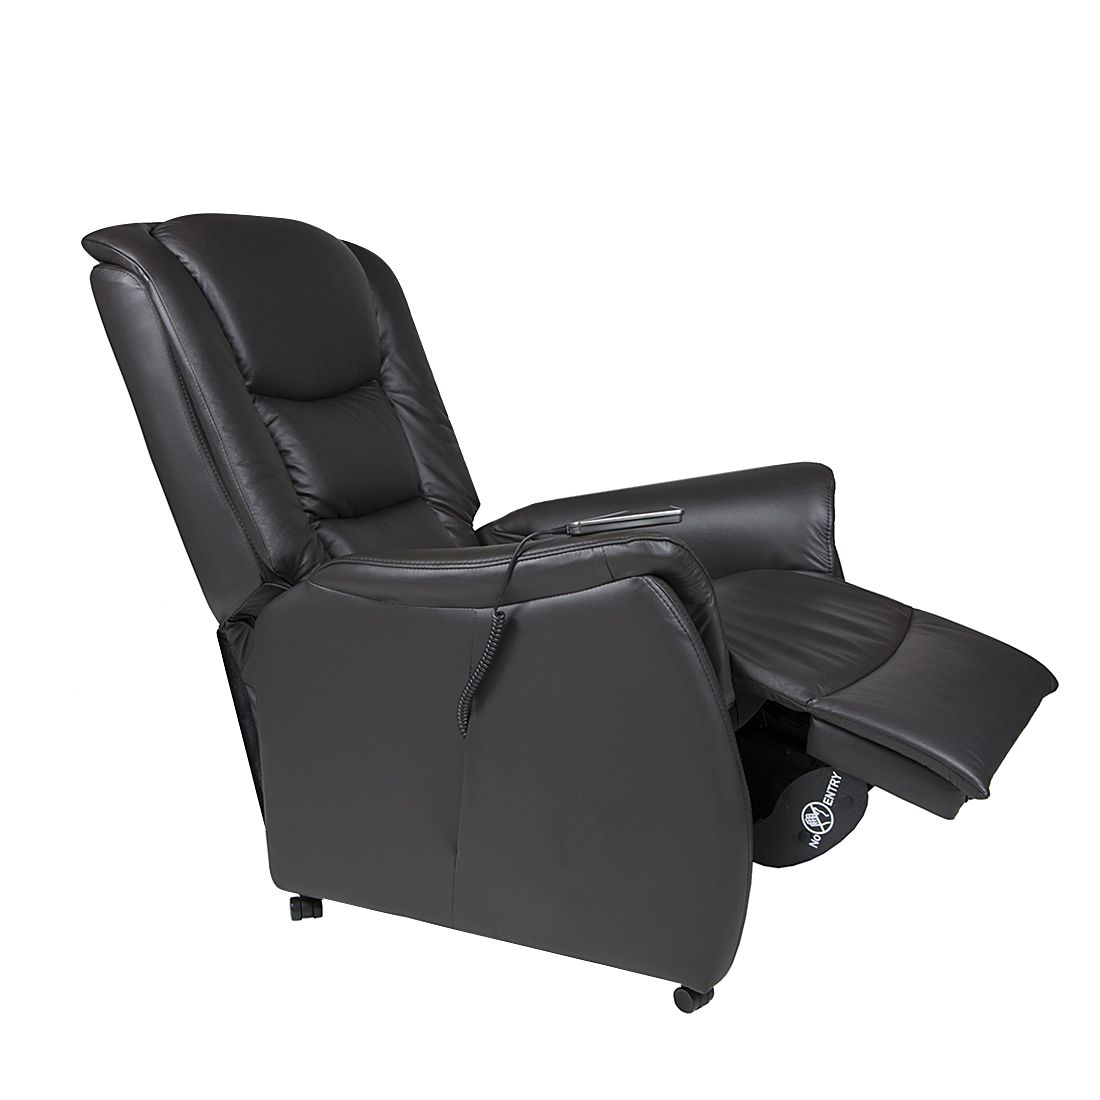 relaxsessel mit motor und cheap klassische mbel tvsessel mit motor und in farben in farbe with. Black Bedroom Furniture Sets. Home Design Ideas